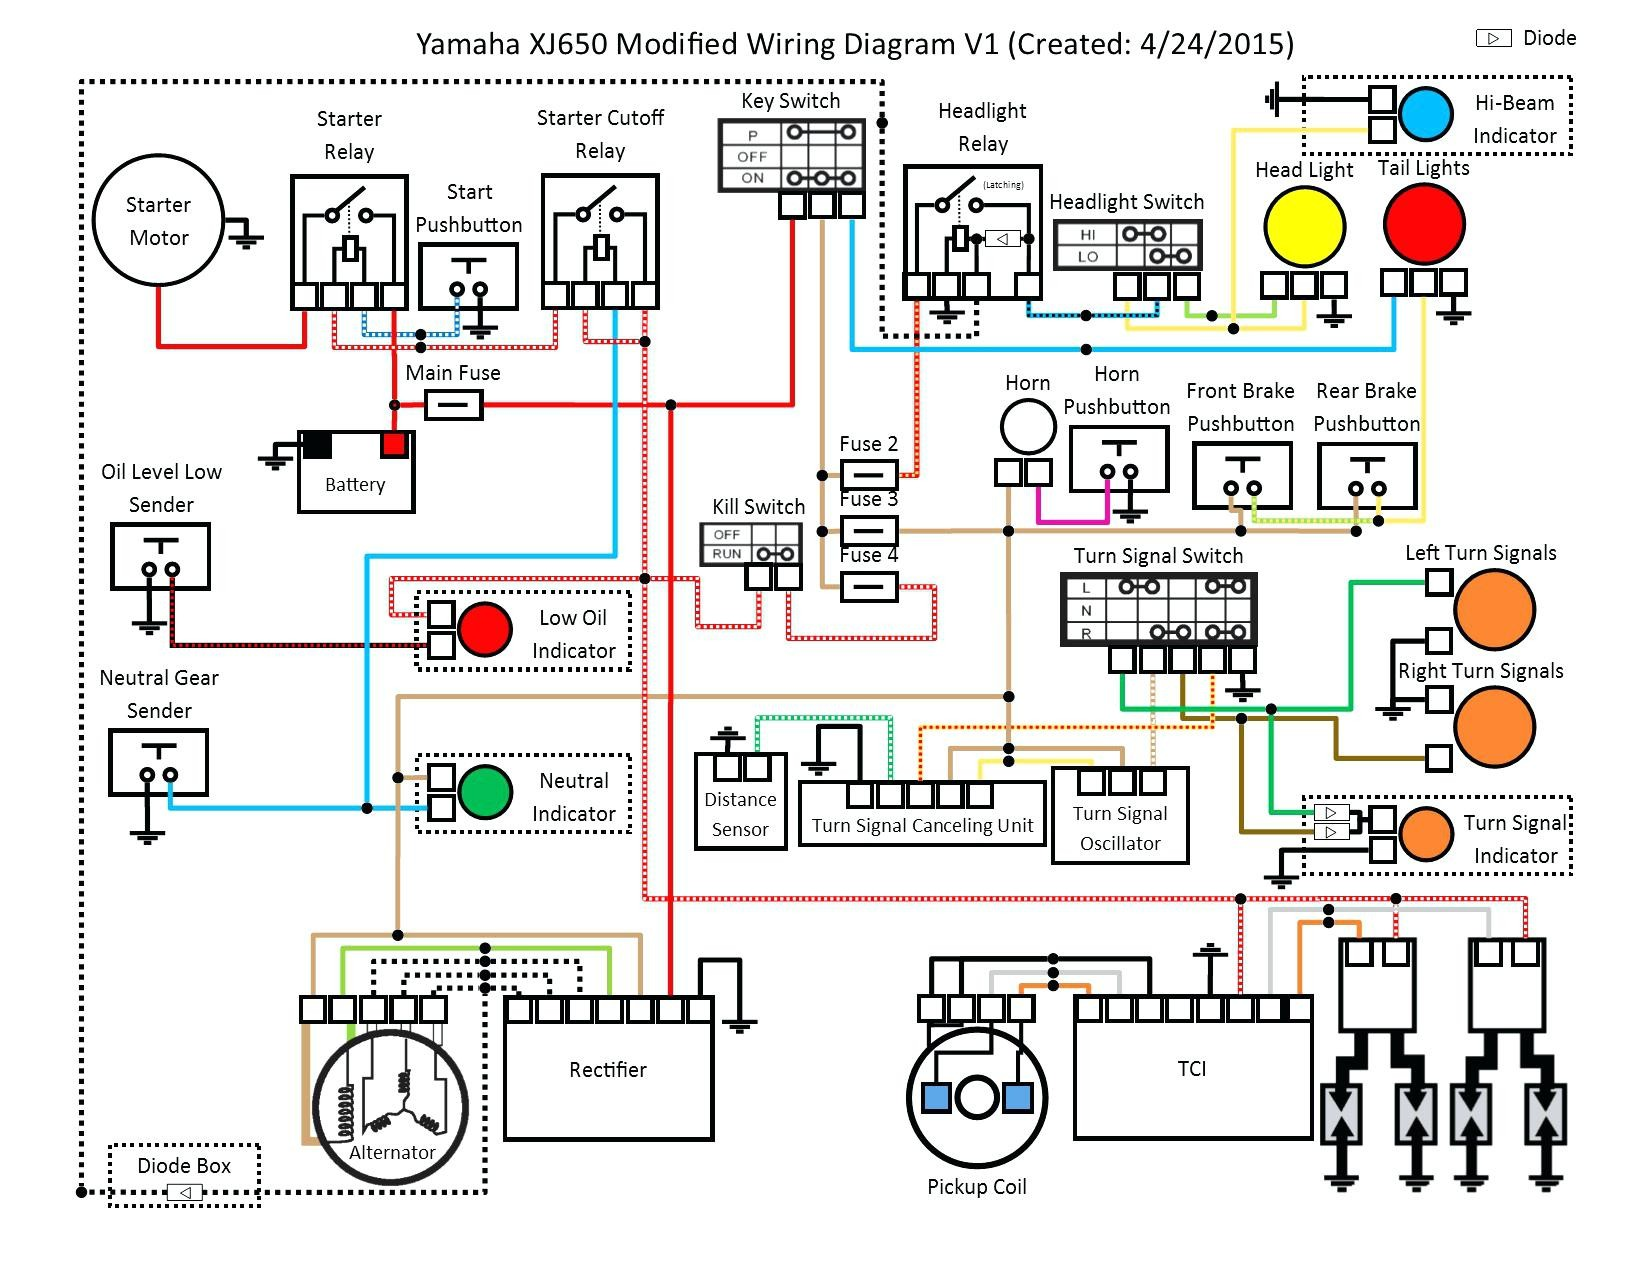 ST_3986] Wiring Diagram Further Snyder General Fortmaker Furnace Wiring  Diagram Download DiagramInifo Geis Kapemie Phot Hroni Frag Frag Teria Unre Garna Mohammedshrine  Librar Wiring 101